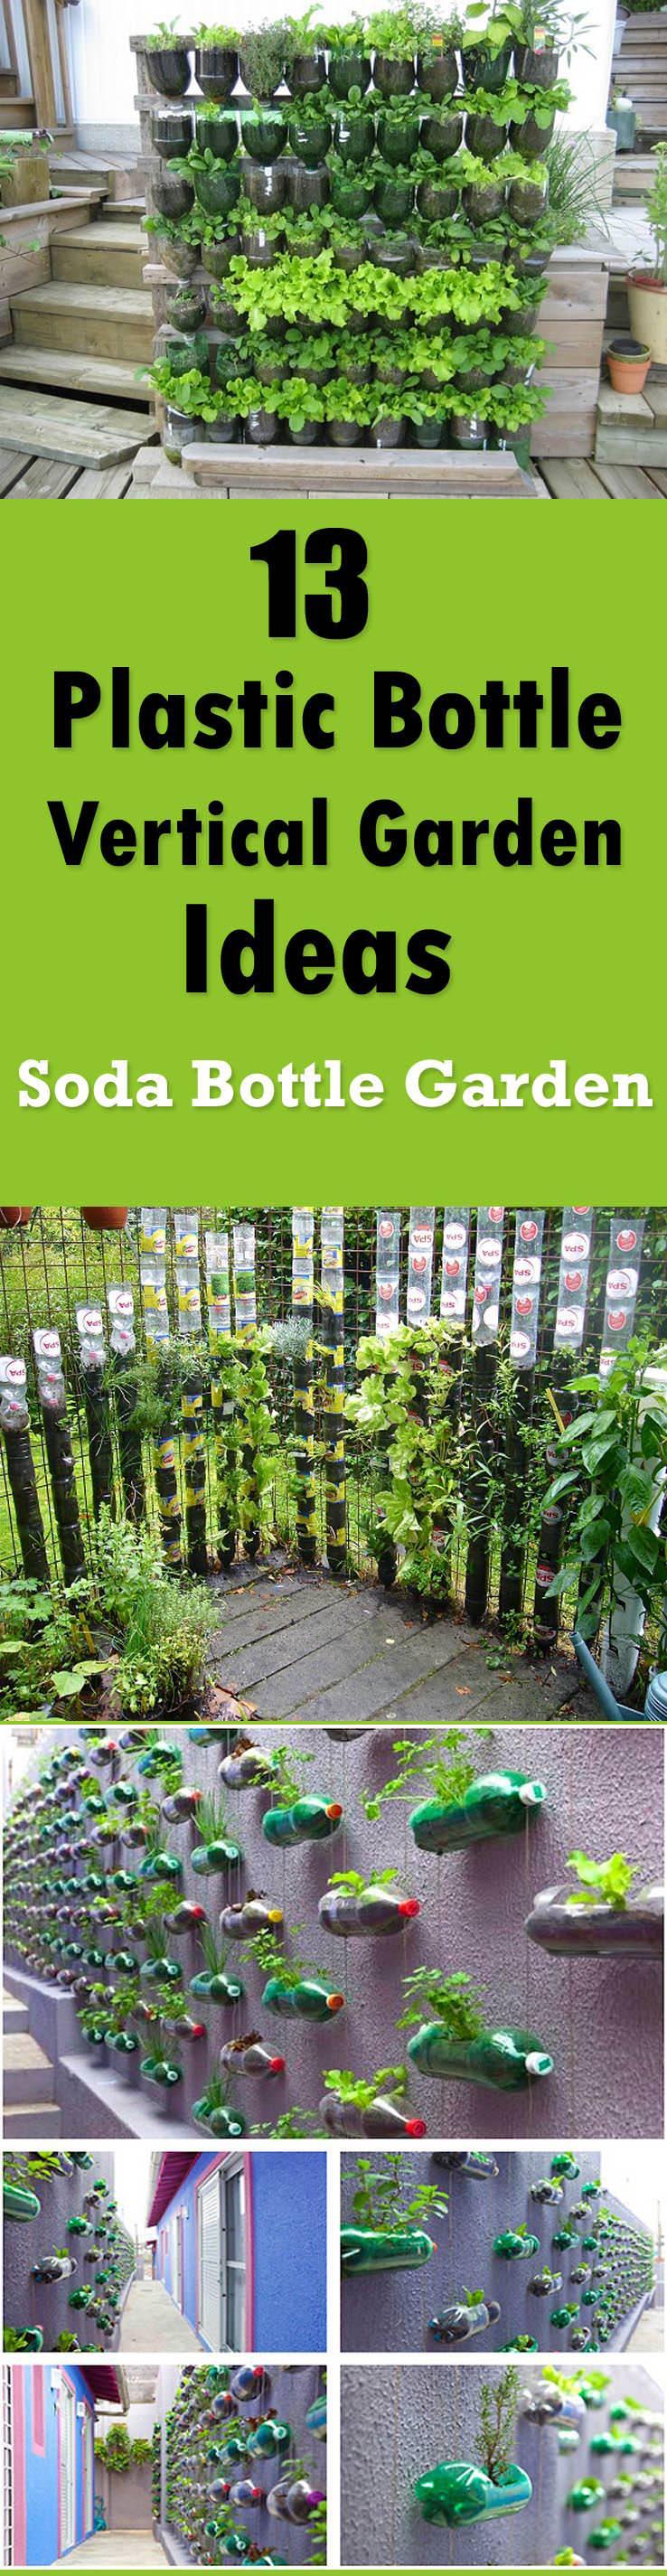 Excellent Plastic Bottle Verticle Garden Ideas Plastic Bottle Vertical Garden Ideas Soda Bottle Garden Vegetable Container Gardening Ideas S Vegetable Garden Planter Box Ideas